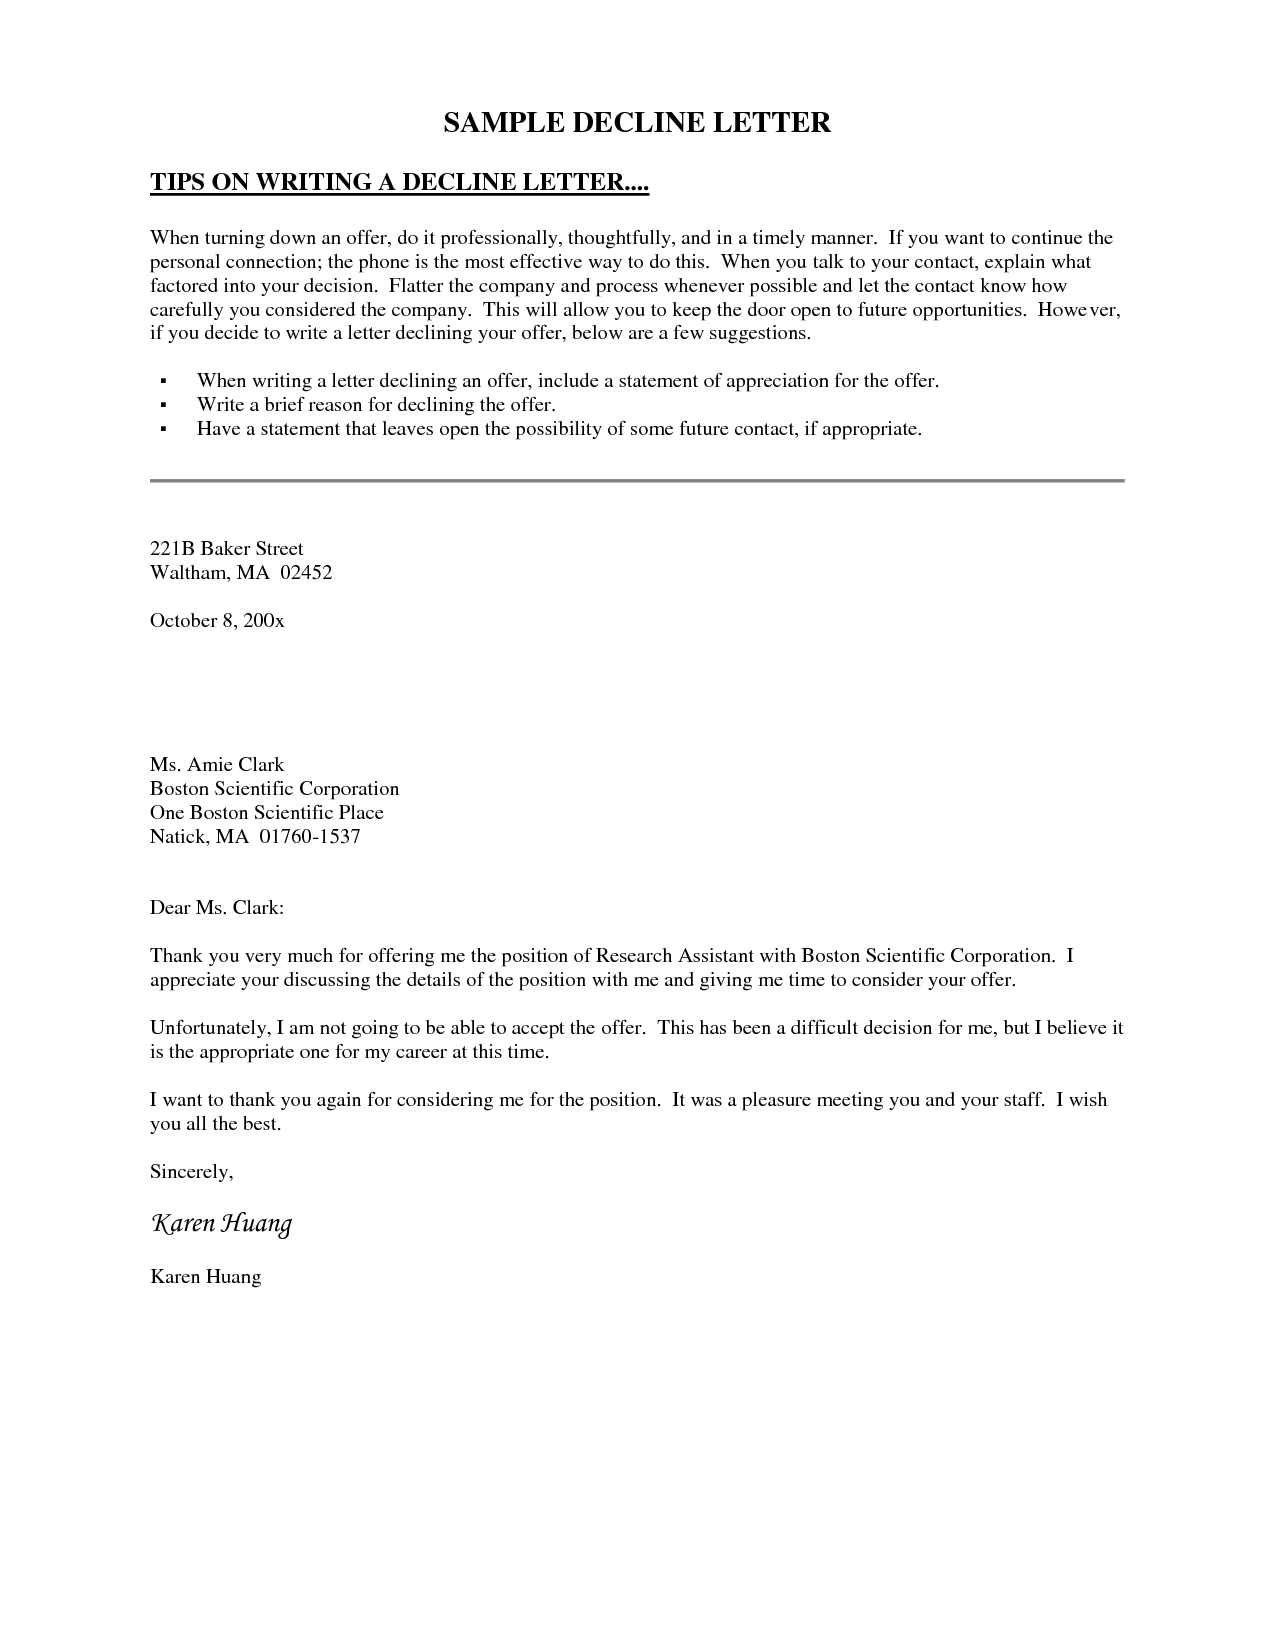 decline letter template